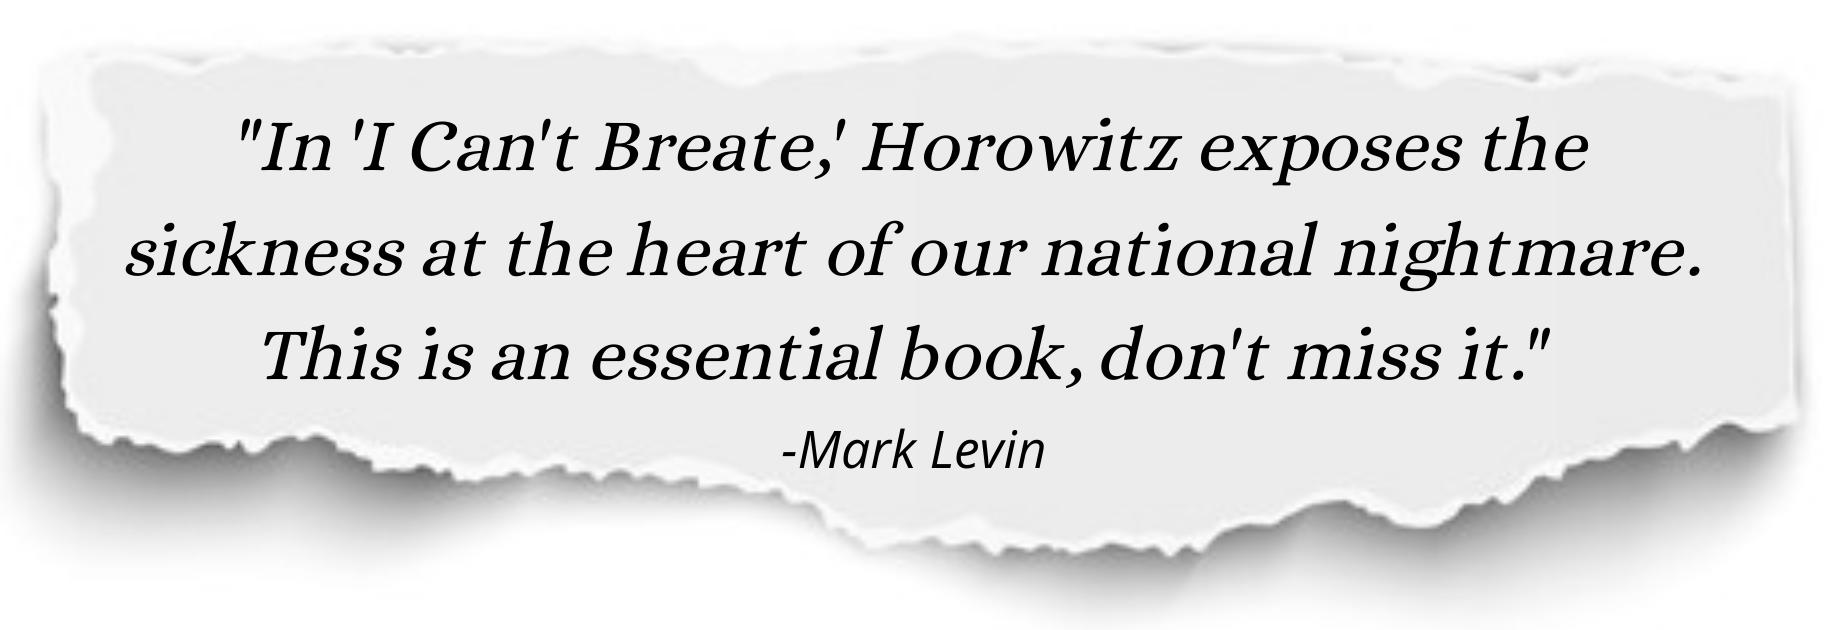 Mark Levin Quote